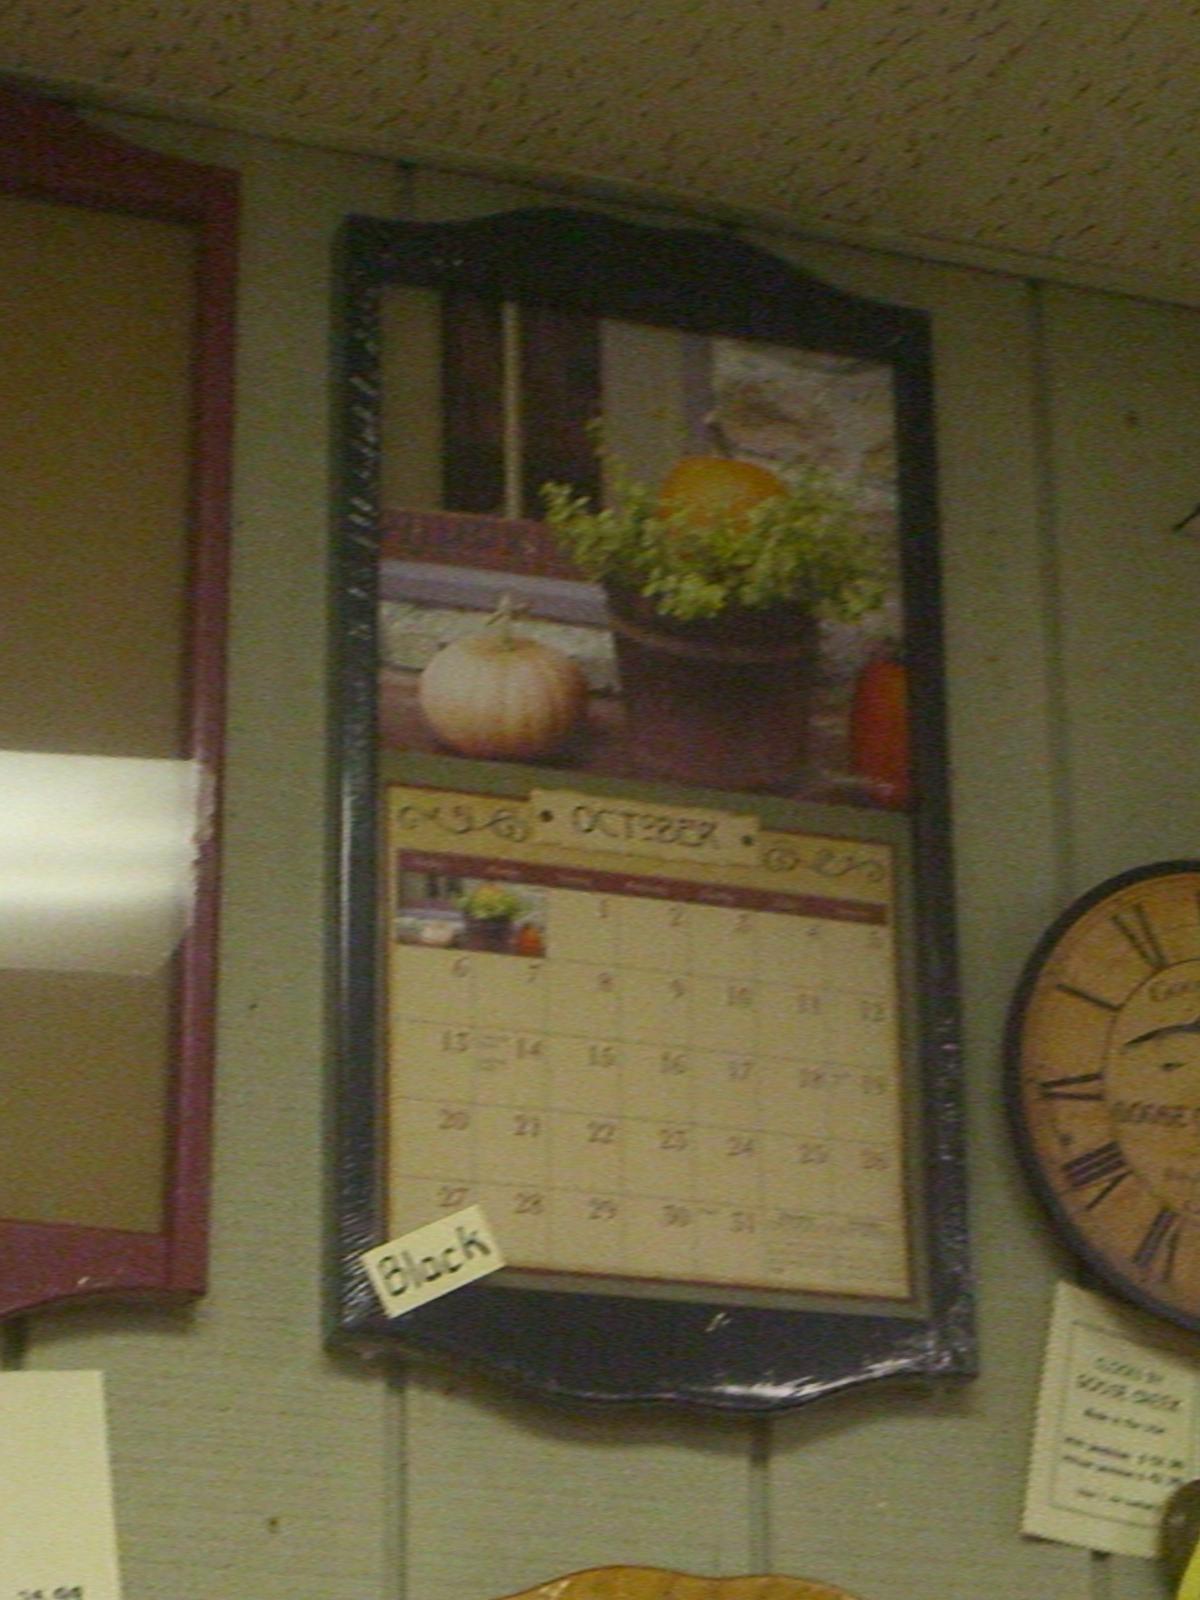 Wall Calendar Frames And Holders  Calendar Inspiration Design pertaining to Wall Calendar Frames